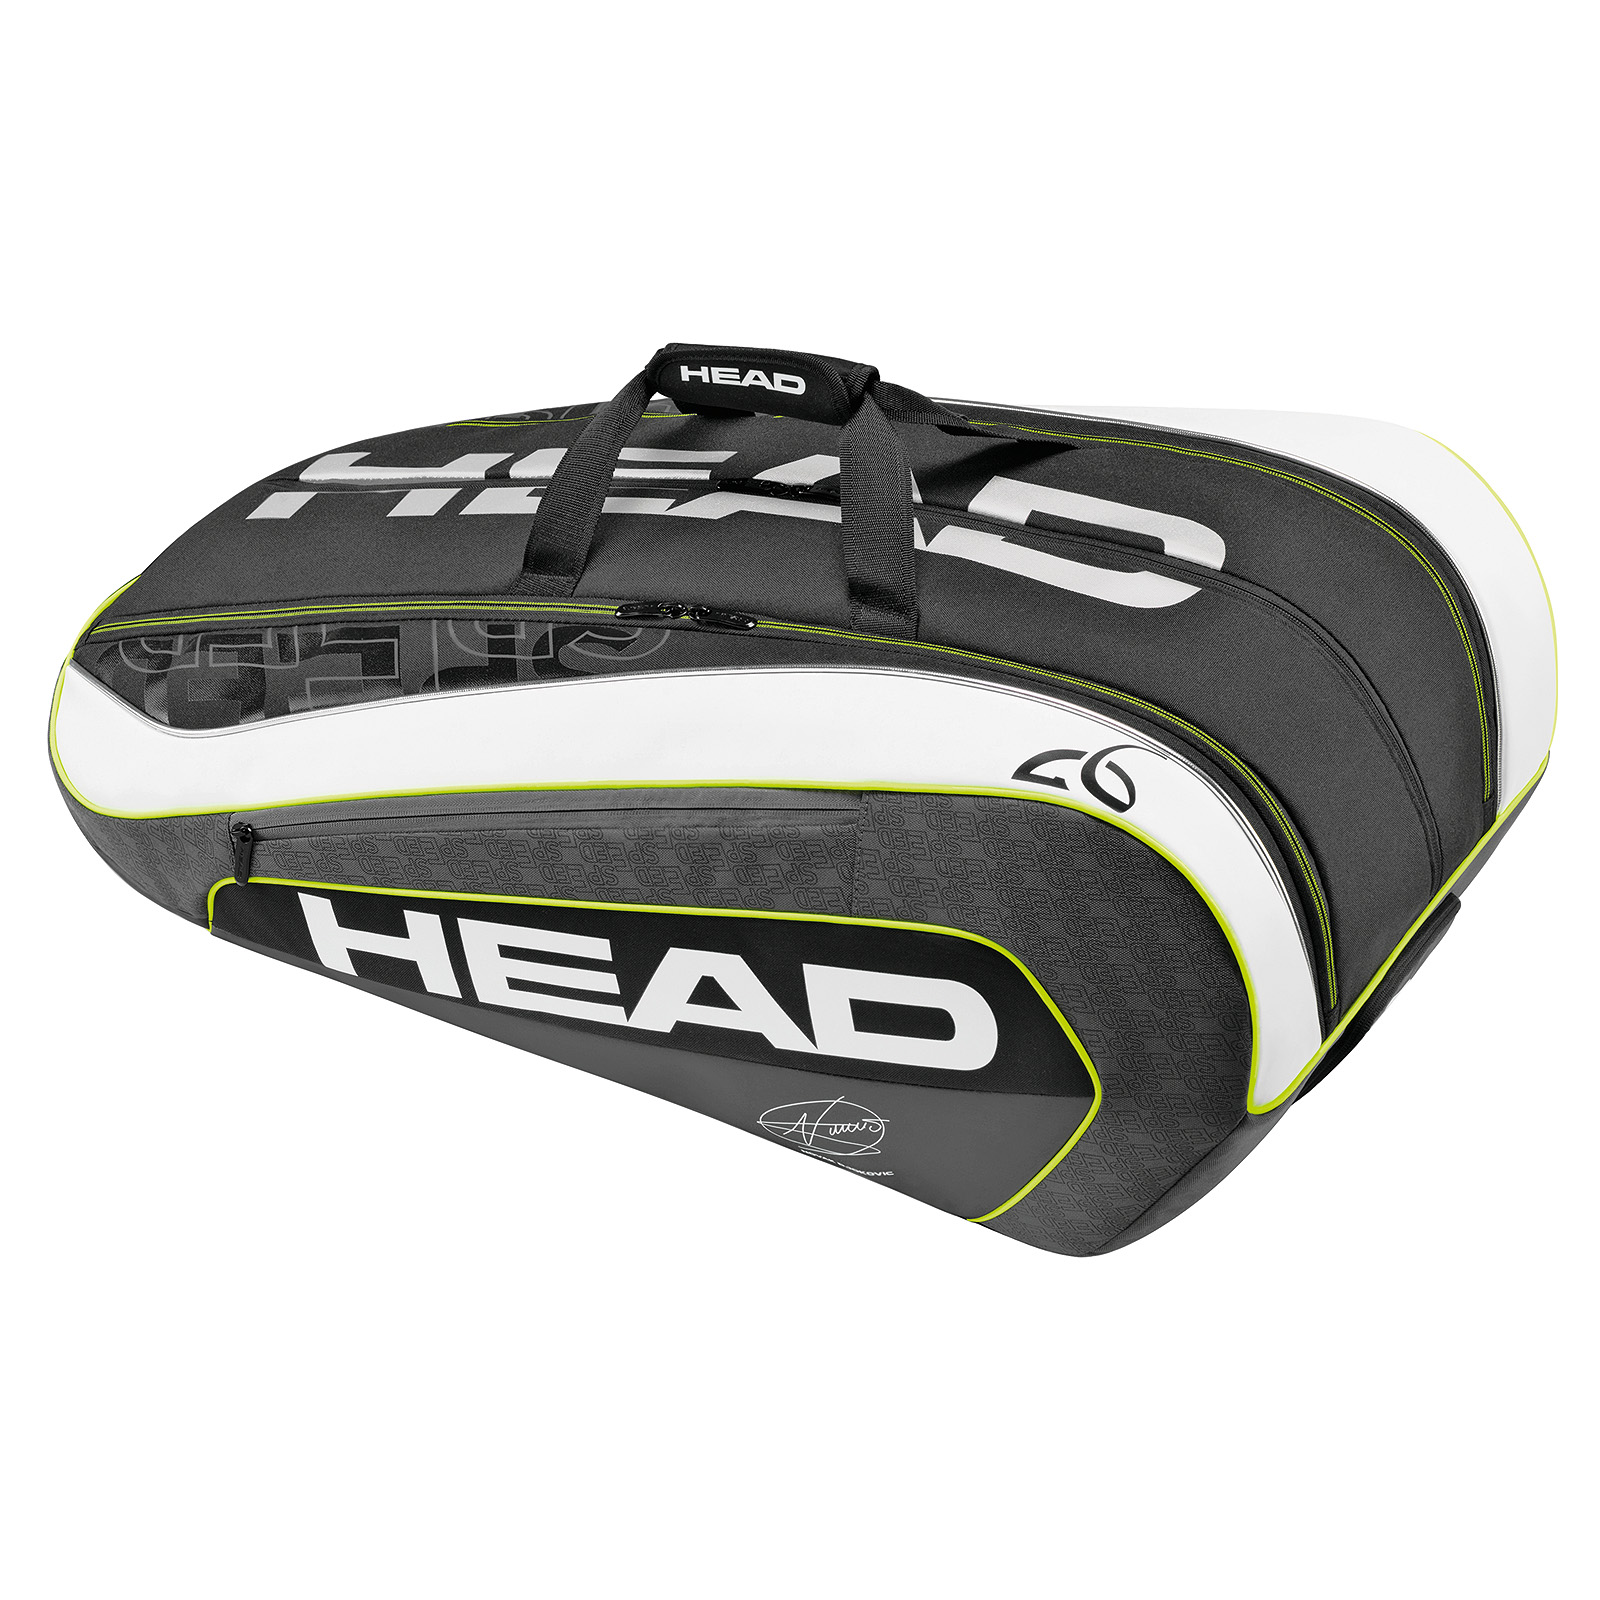 HEAD Djokovic 12R Monstercombi